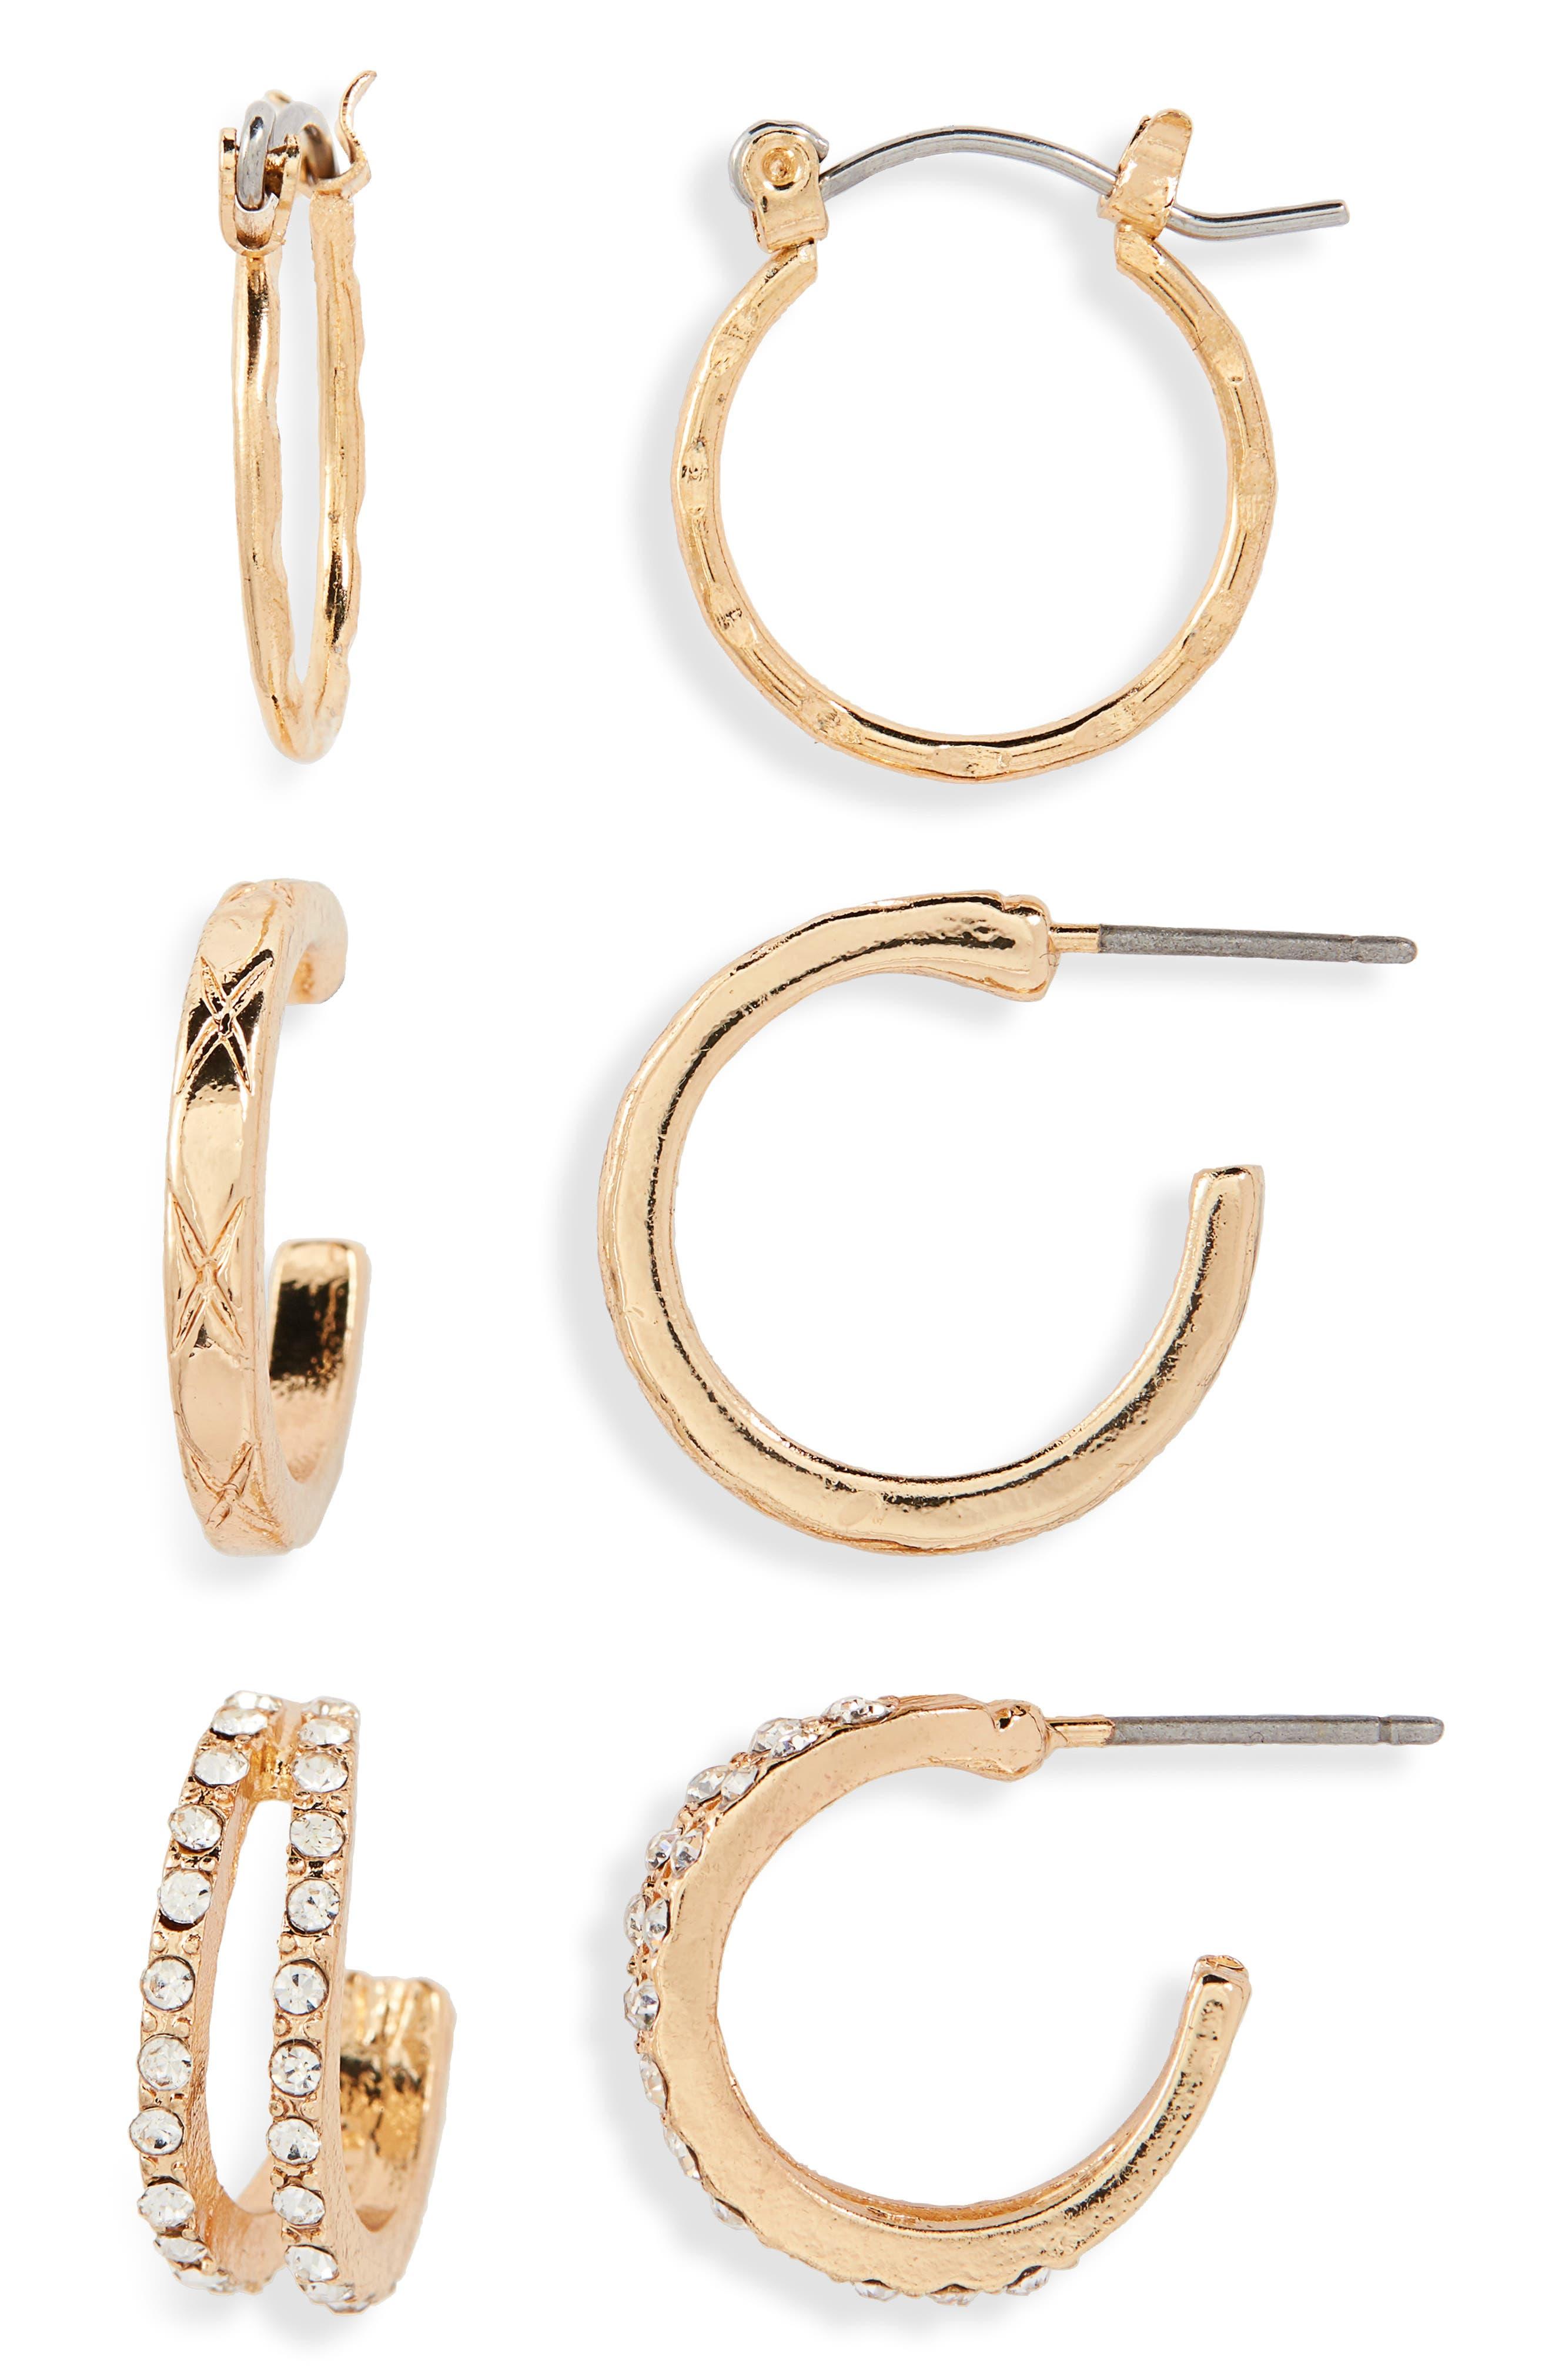 3-Pack Mini Hoop Earrings,                             Main thumbnail 1, color,                             GOLD/ CRYSTAL